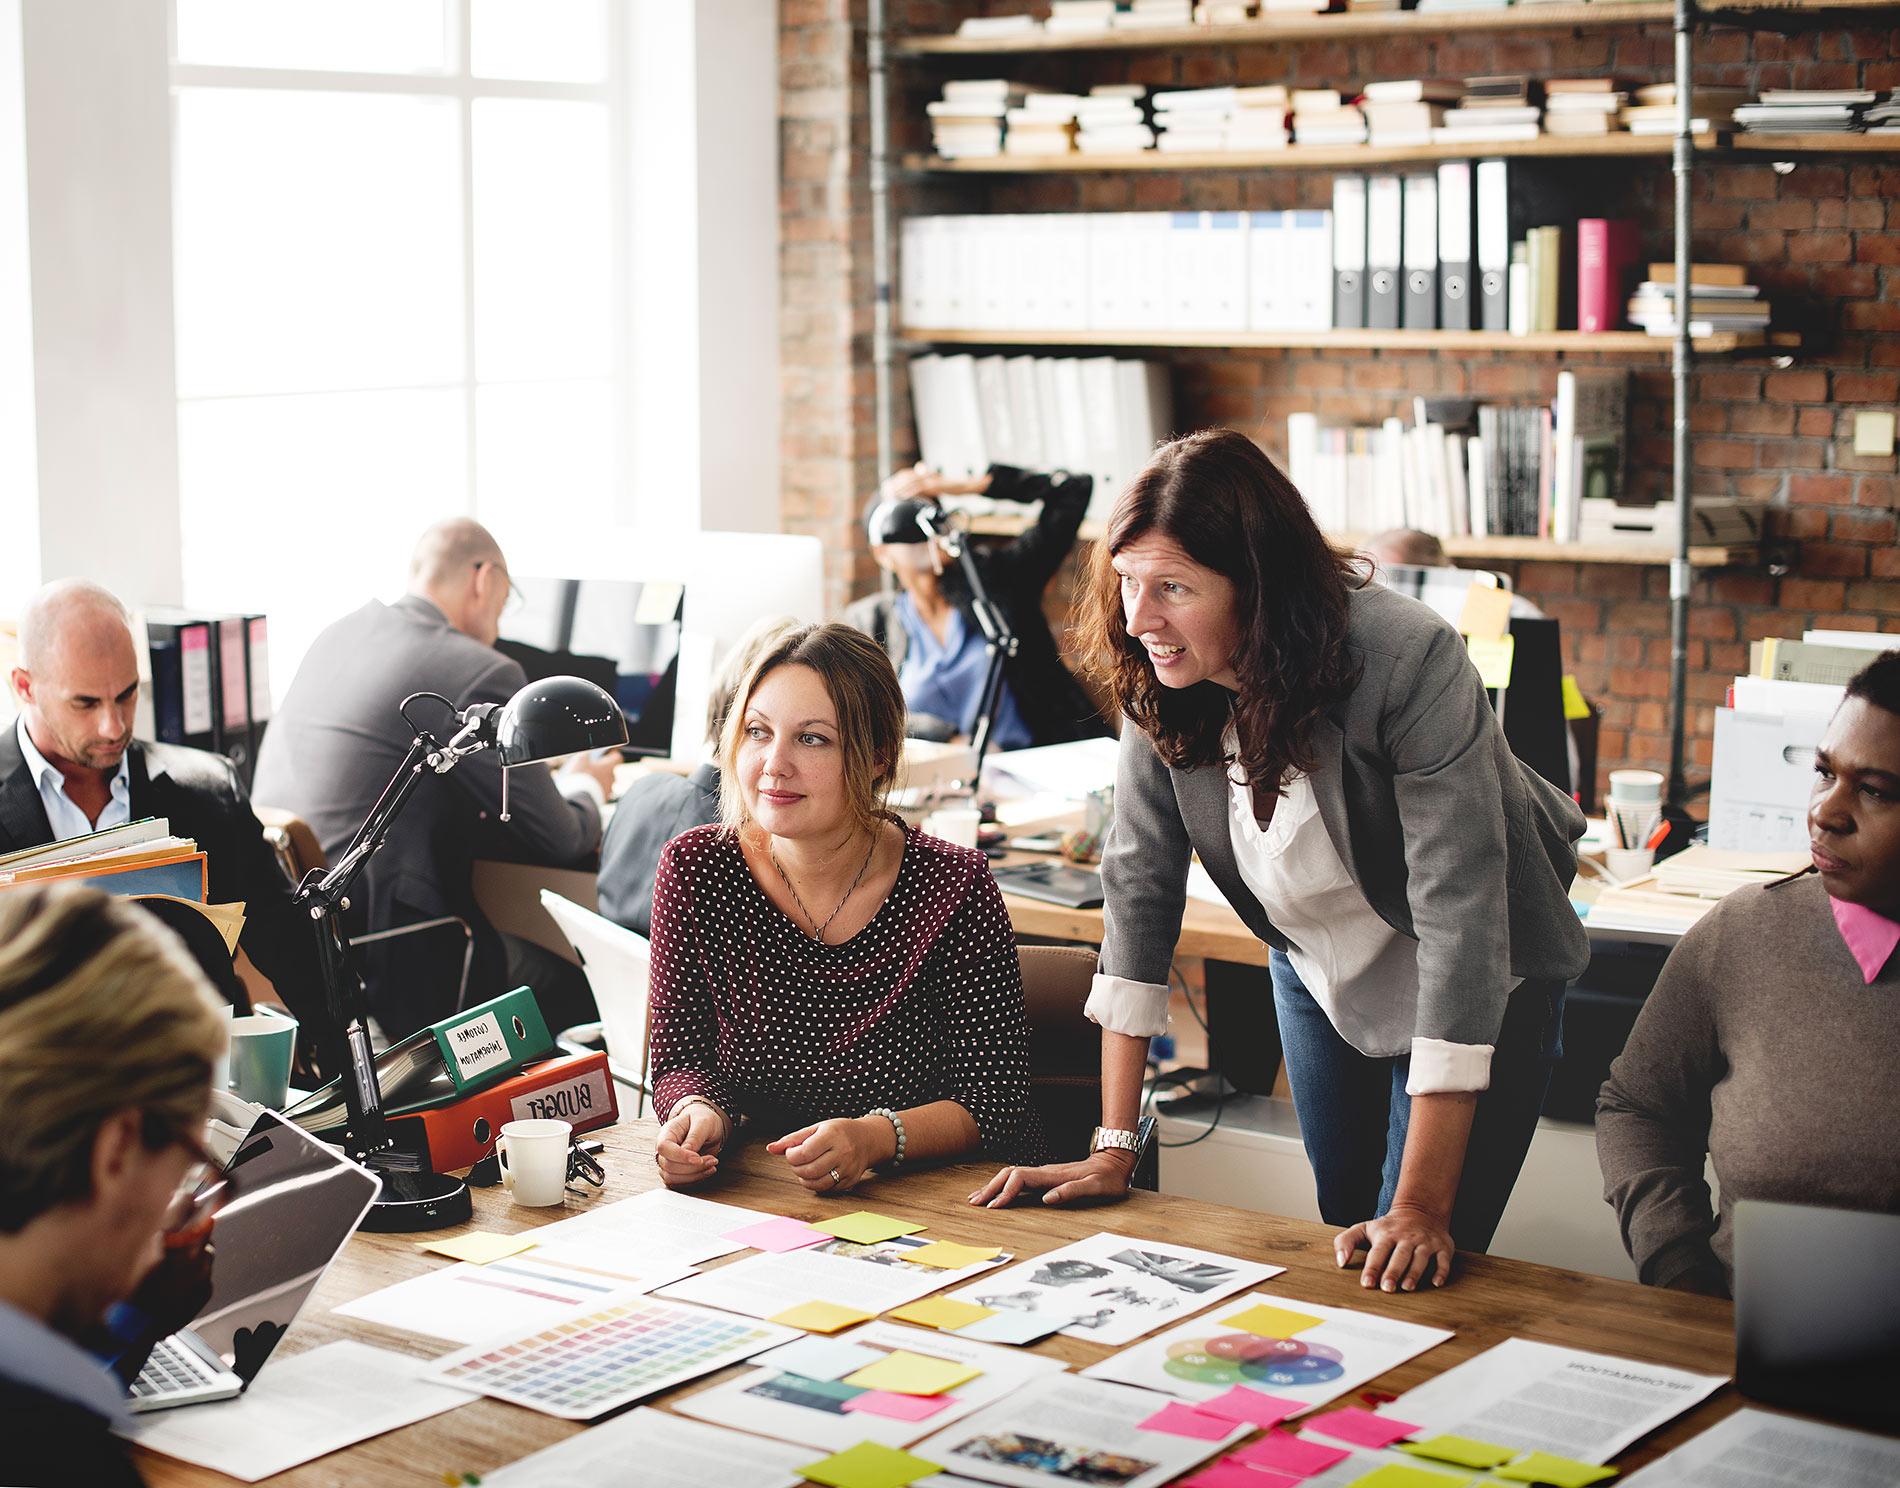 Les ETI et PME qui ont une strategie numerique gagnent plus et embauchent plus